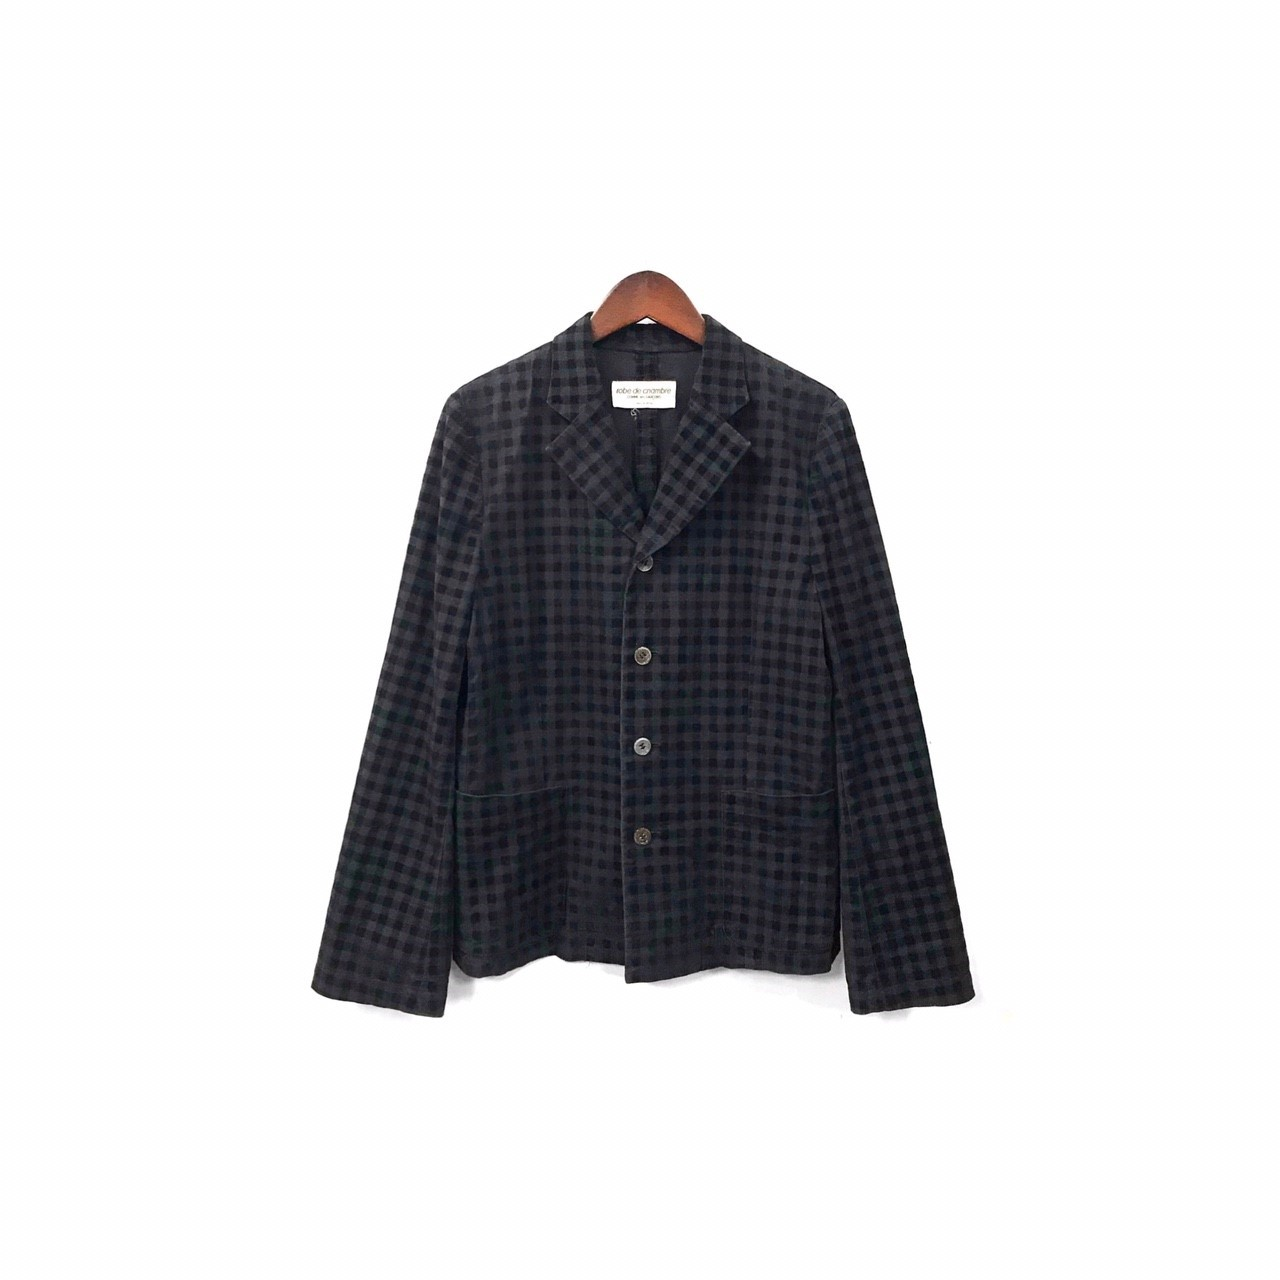 robe de chambre COMME des GARCONS - Check Jacket ¥8500+tax